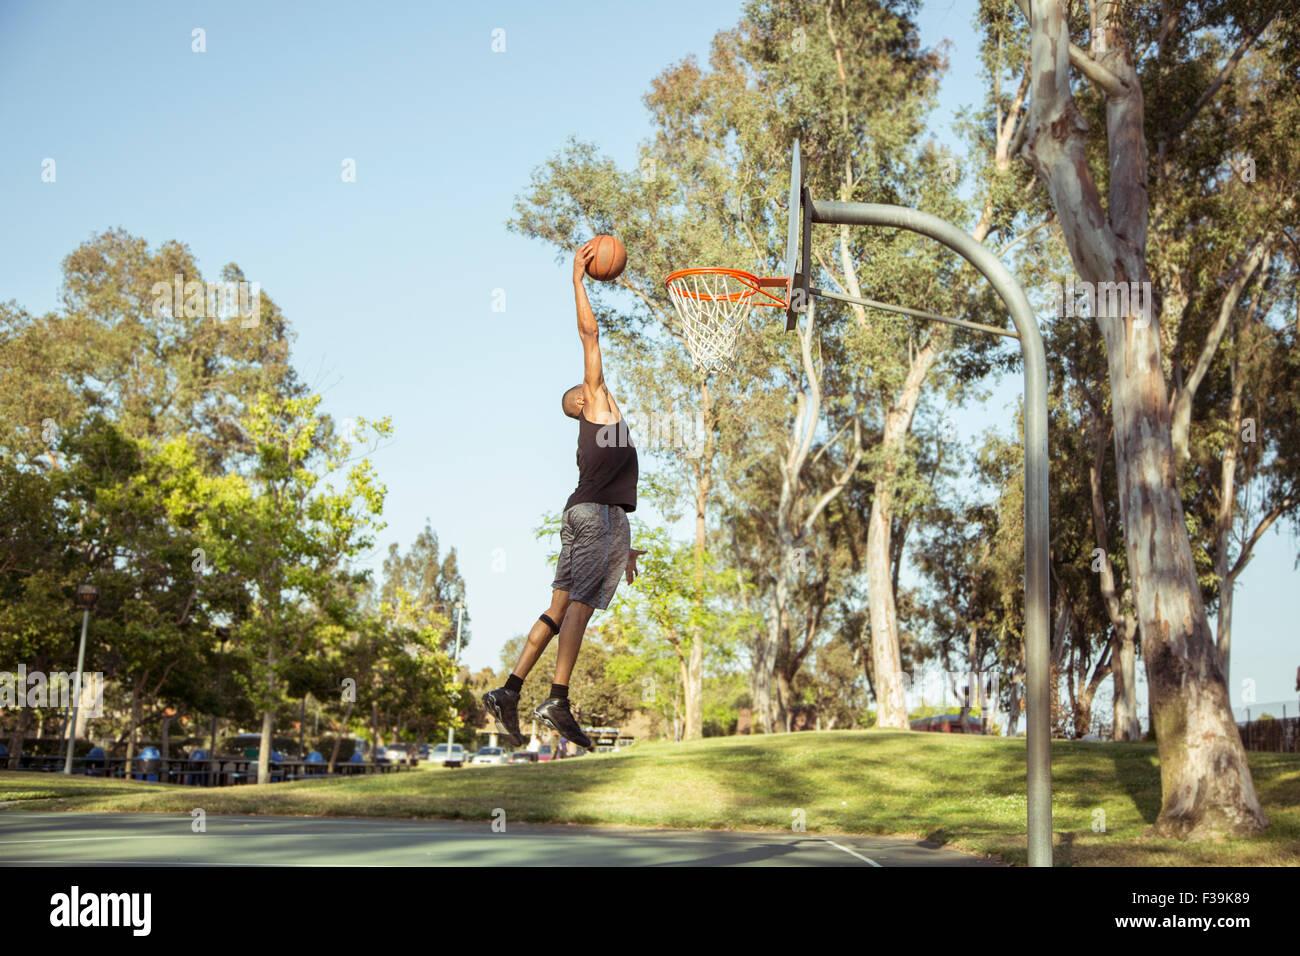 Mann schießen Basketballkörbe im Park bei Sonnenuntergang Stockbild